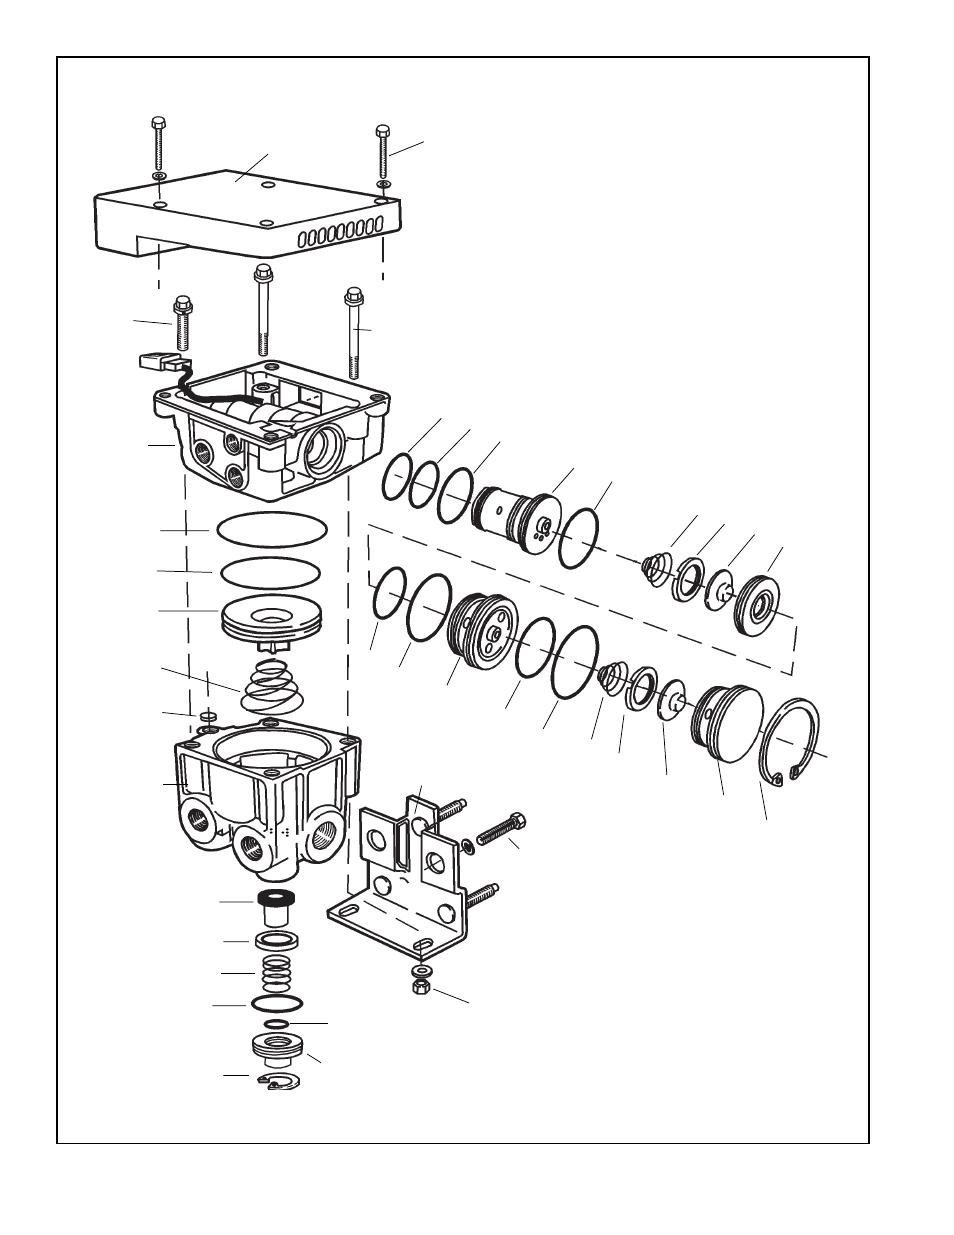 Bendix Commercial Vehicle Systems ATR1DC ANTILOCK TRACTION